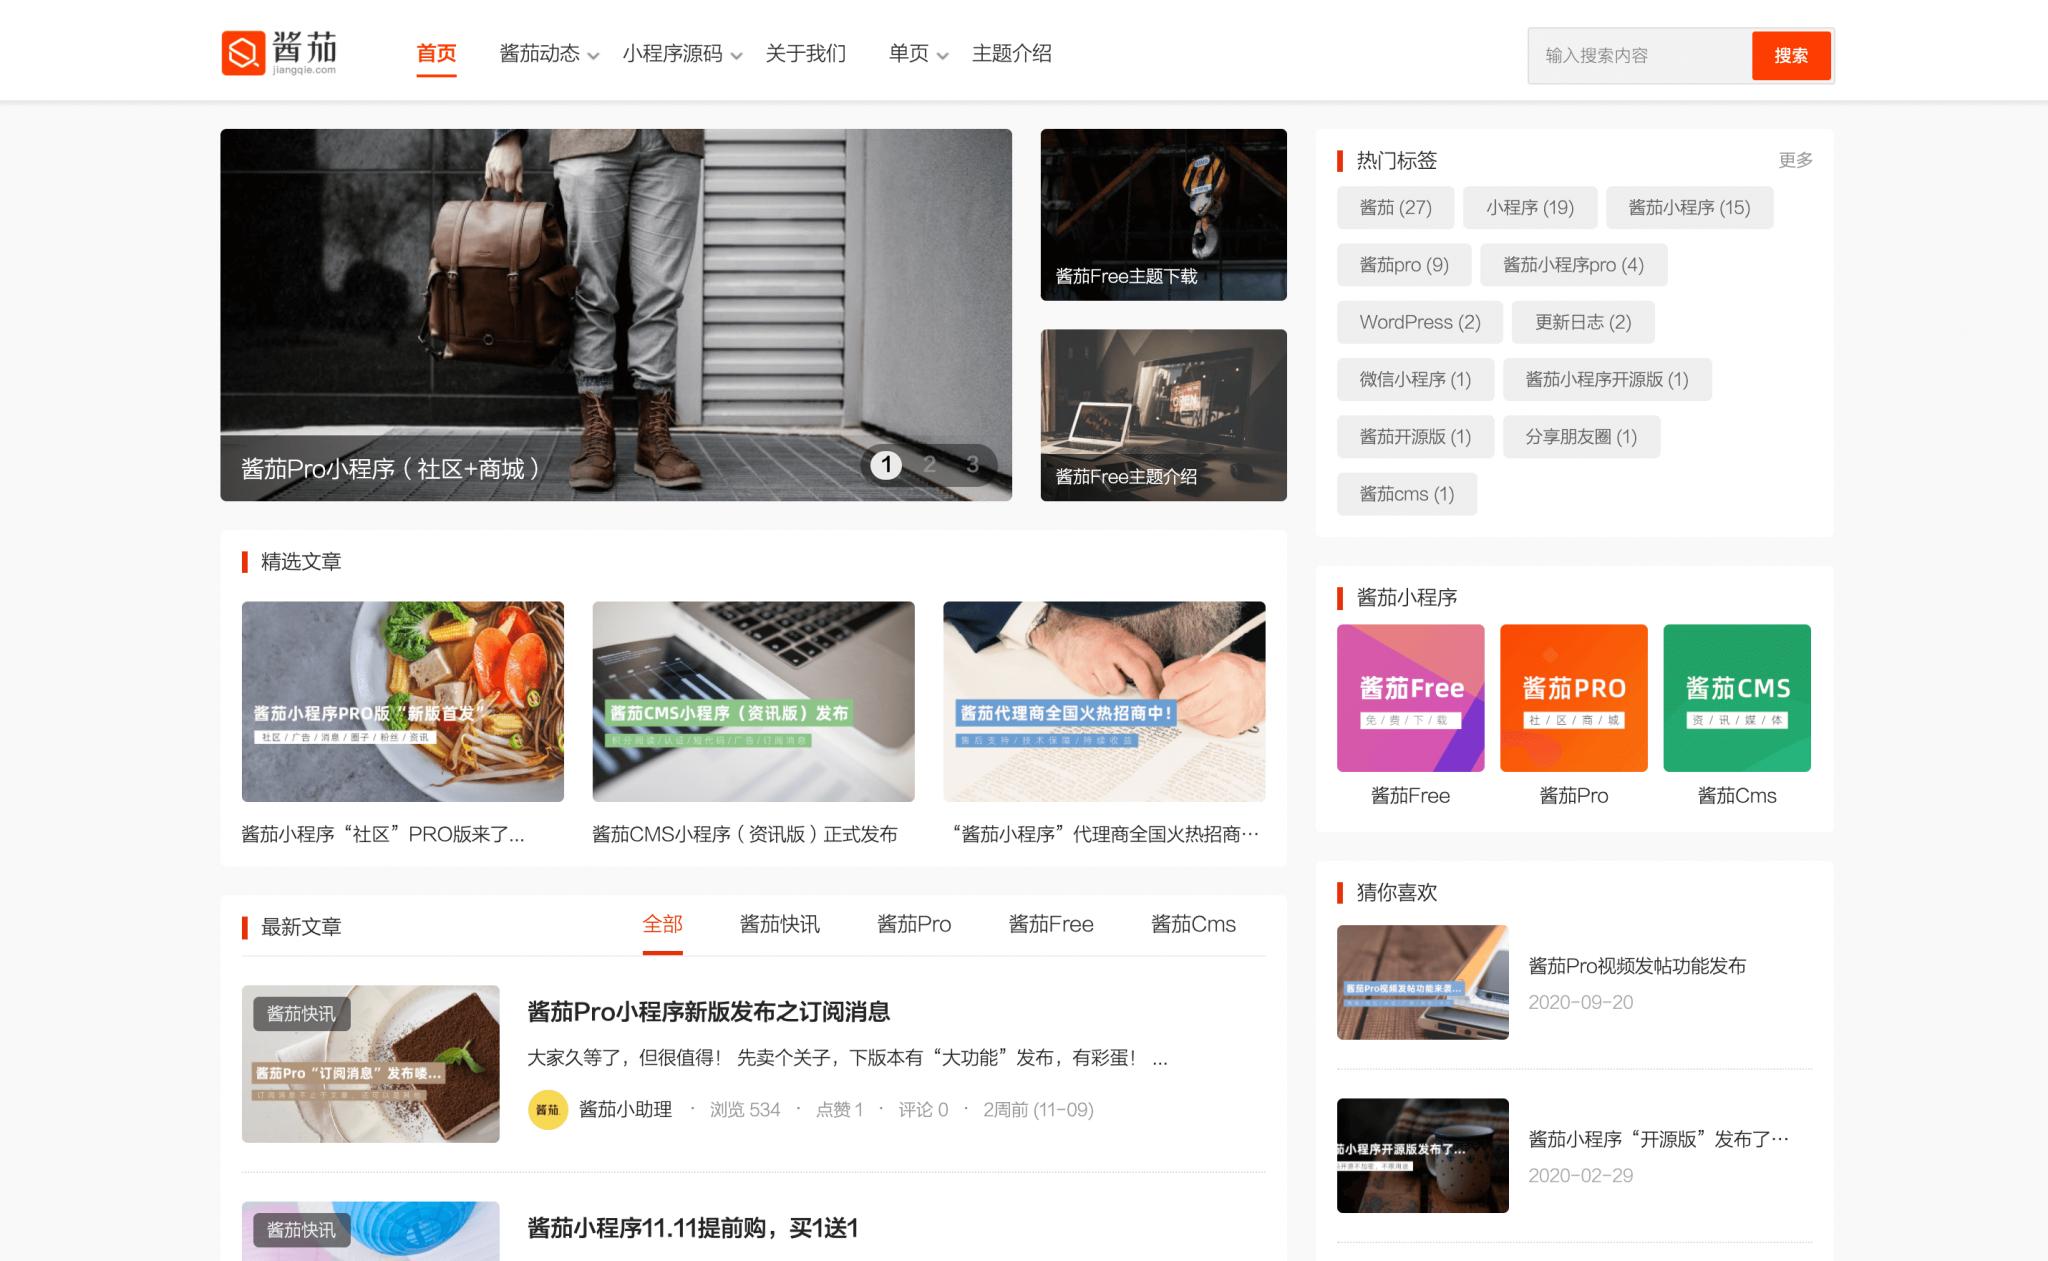 jiangqie酱茄主题-博客资讯自媒体wordpress主题小程序版